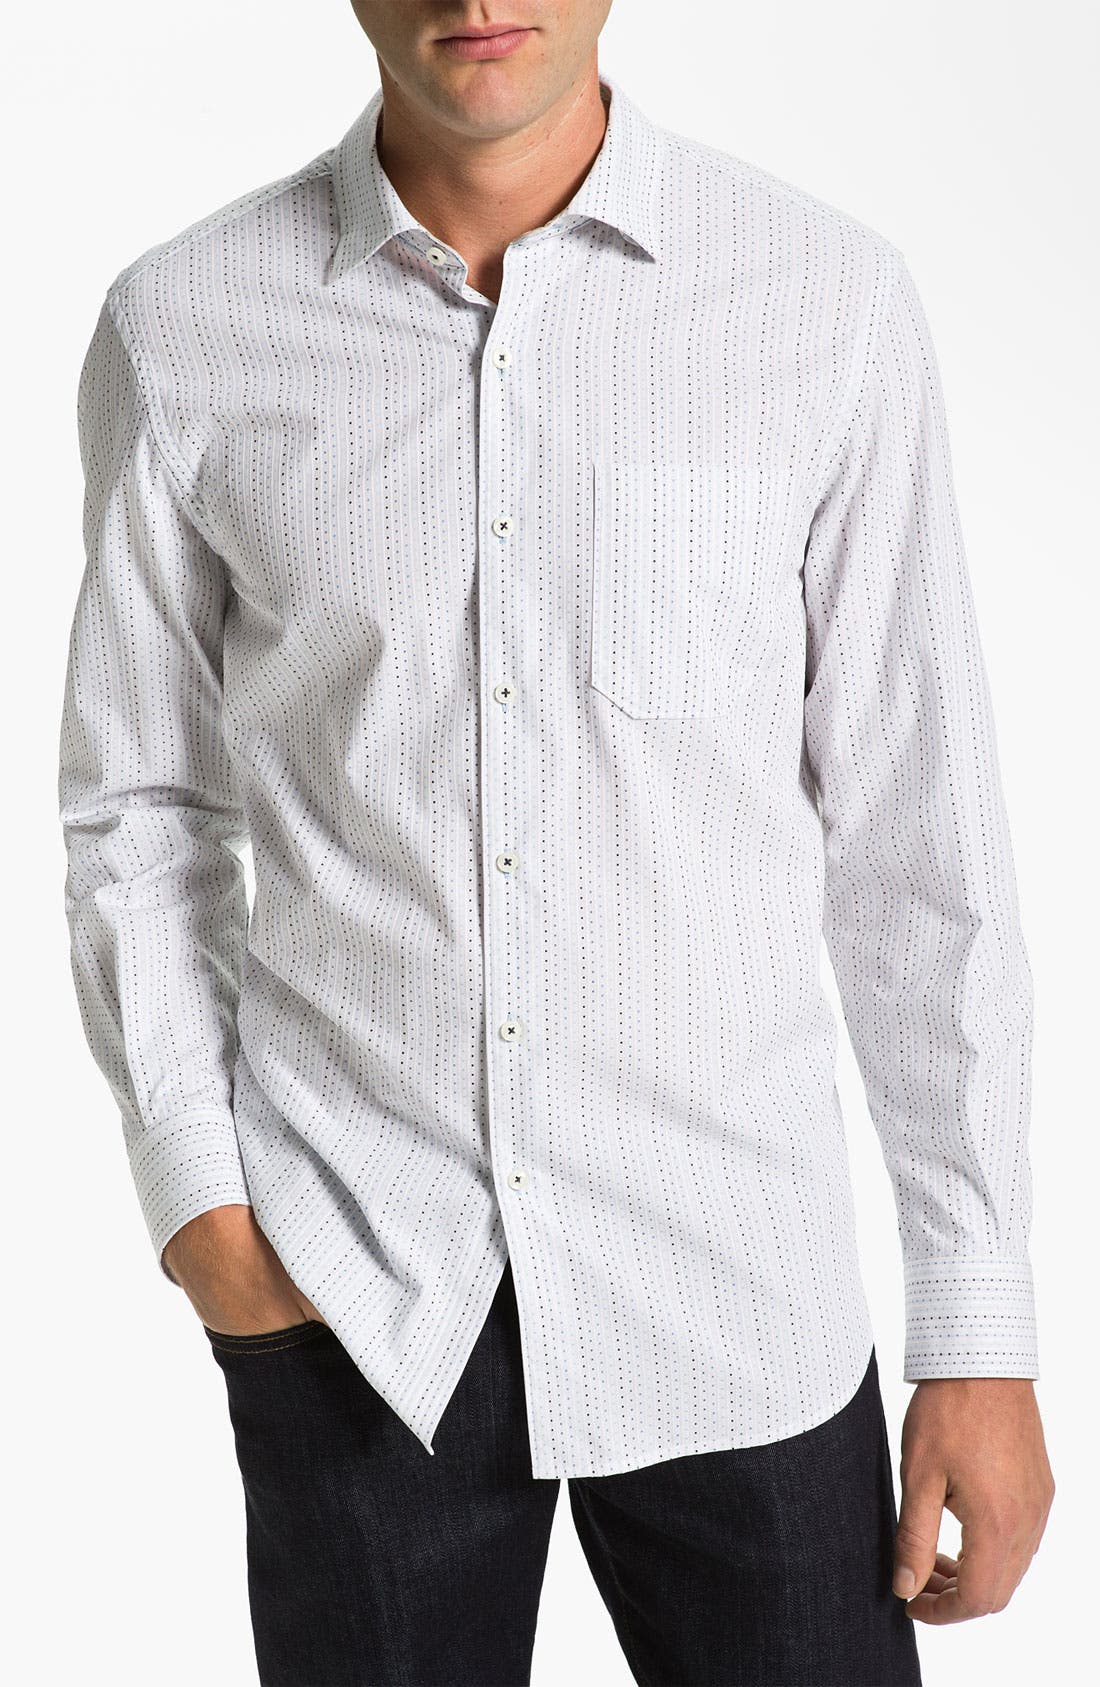 Main Image - Tommy Bahama 'Jacquart-a Stripe' Sport Shirt